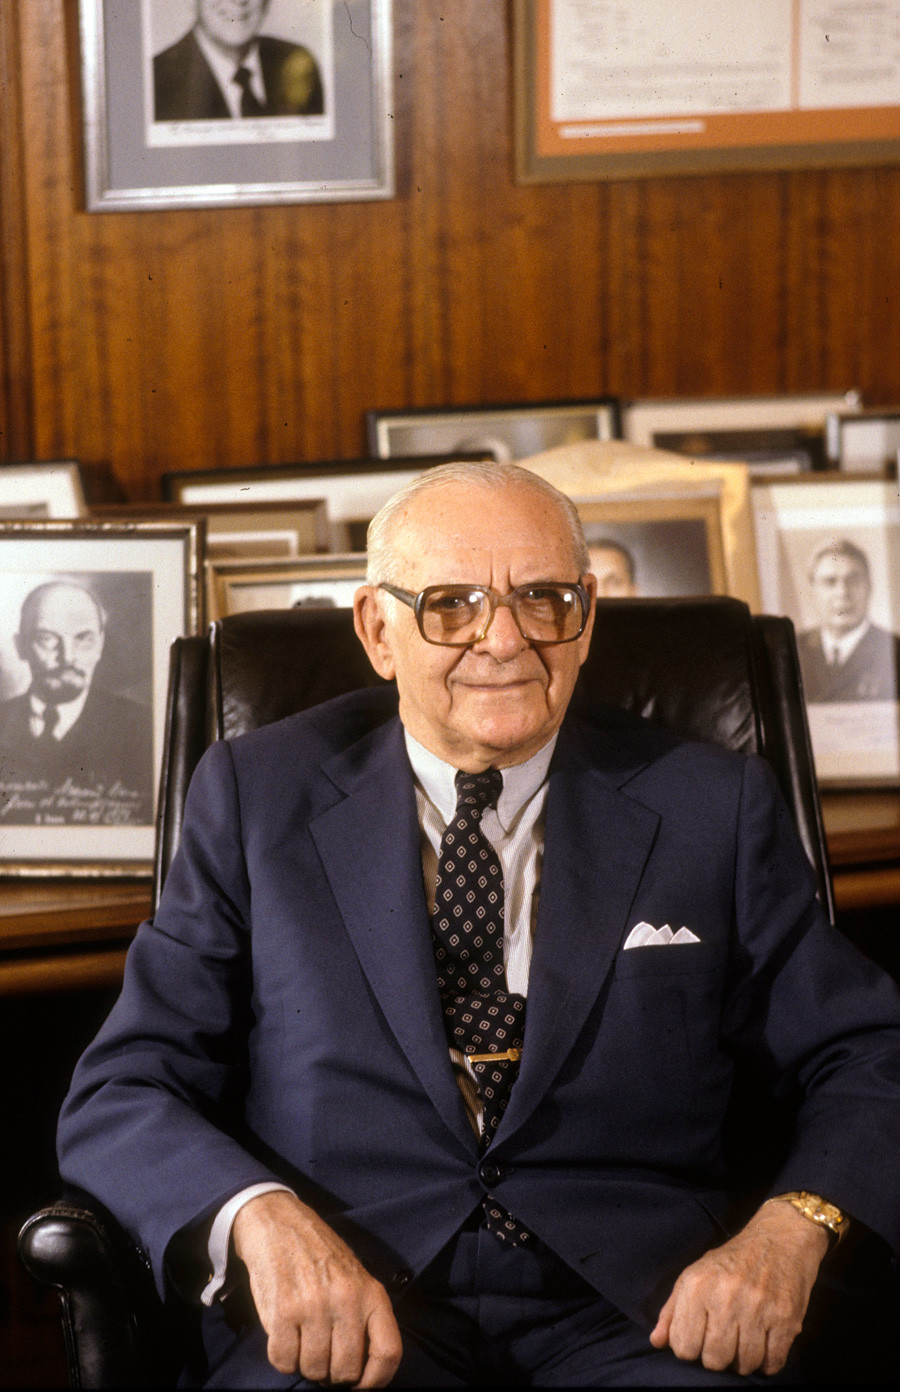 Арманд Хамър, 1 юни 1980 г., Лос Анджелис, Калифорния, САЩ